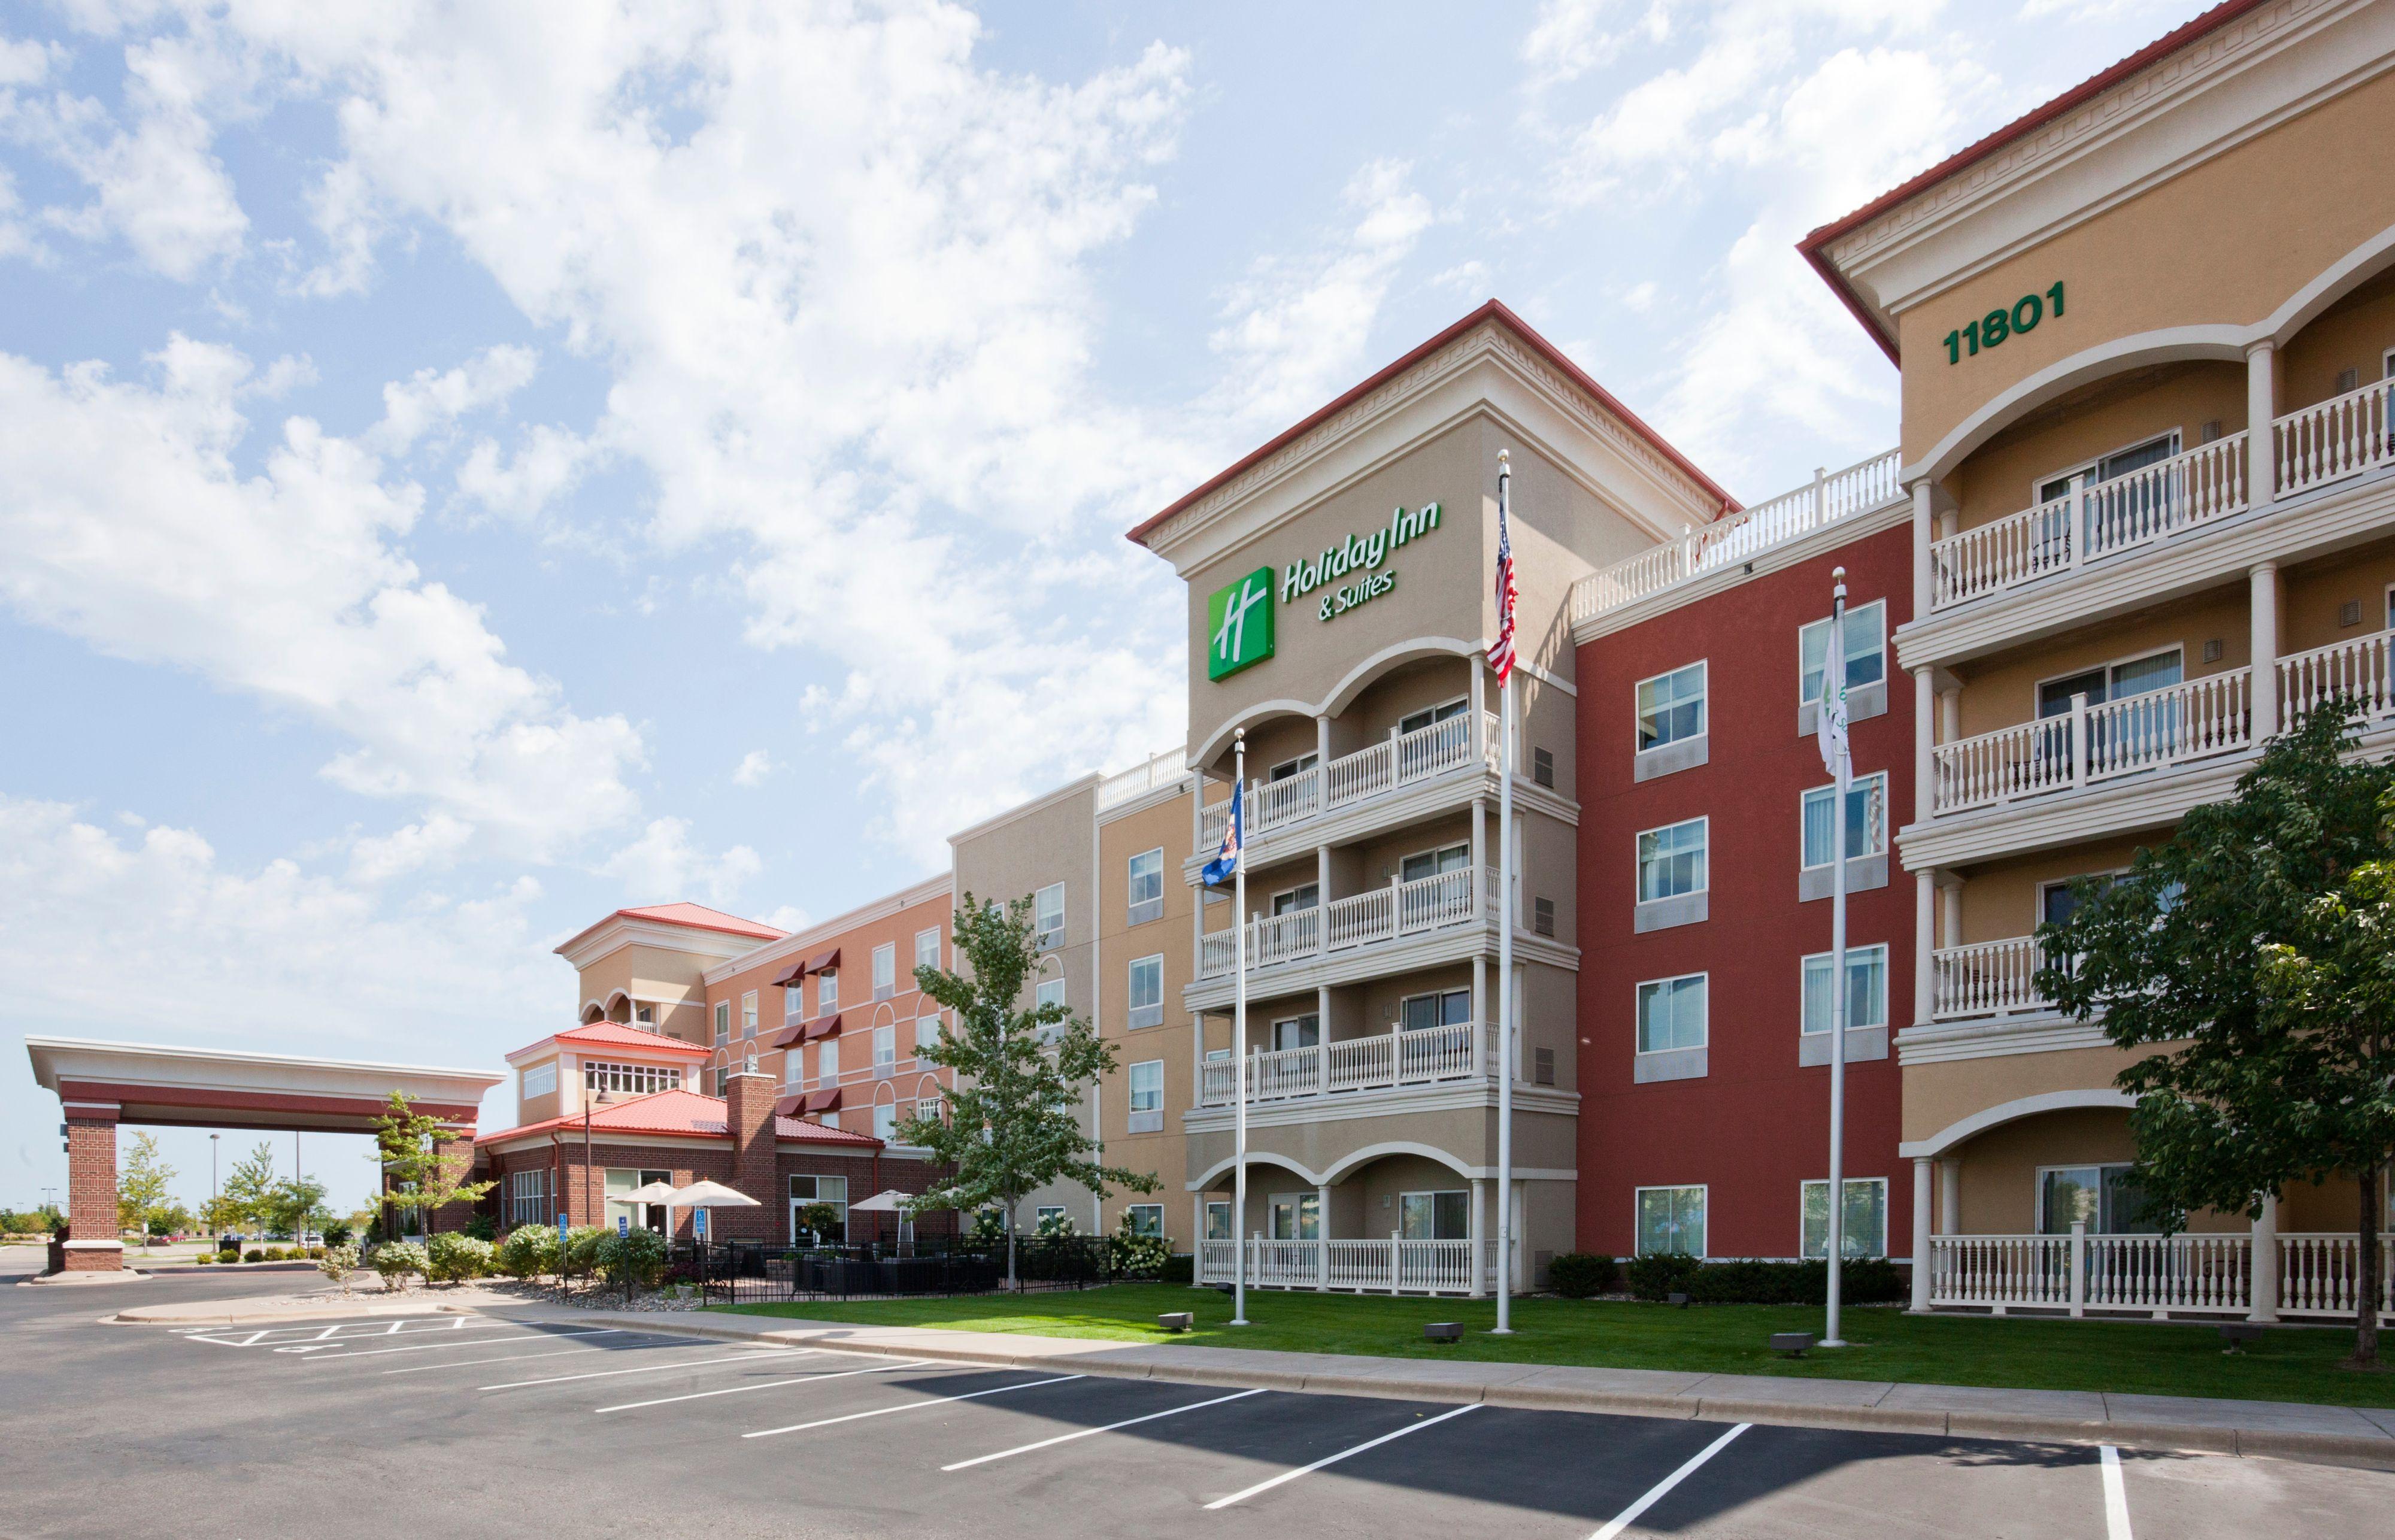 Hotels Motels In Maple Grove Mn Maple Grove Minnesota